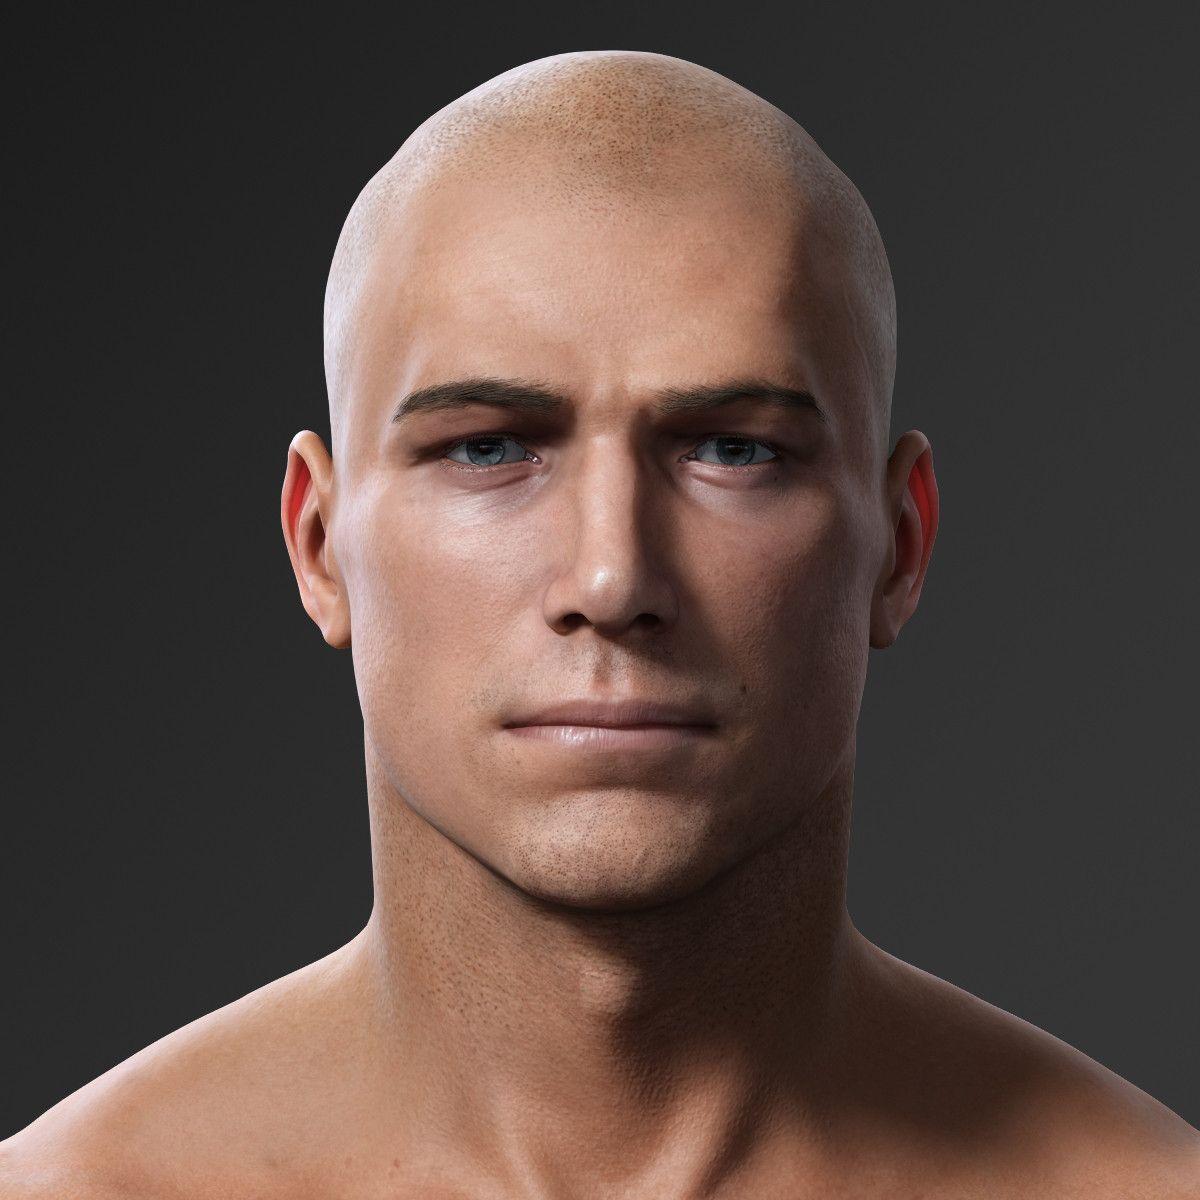 Photorealistic Male Body Realistic Head Model Male Face Drawing Male Body Drawing 3d Face Model